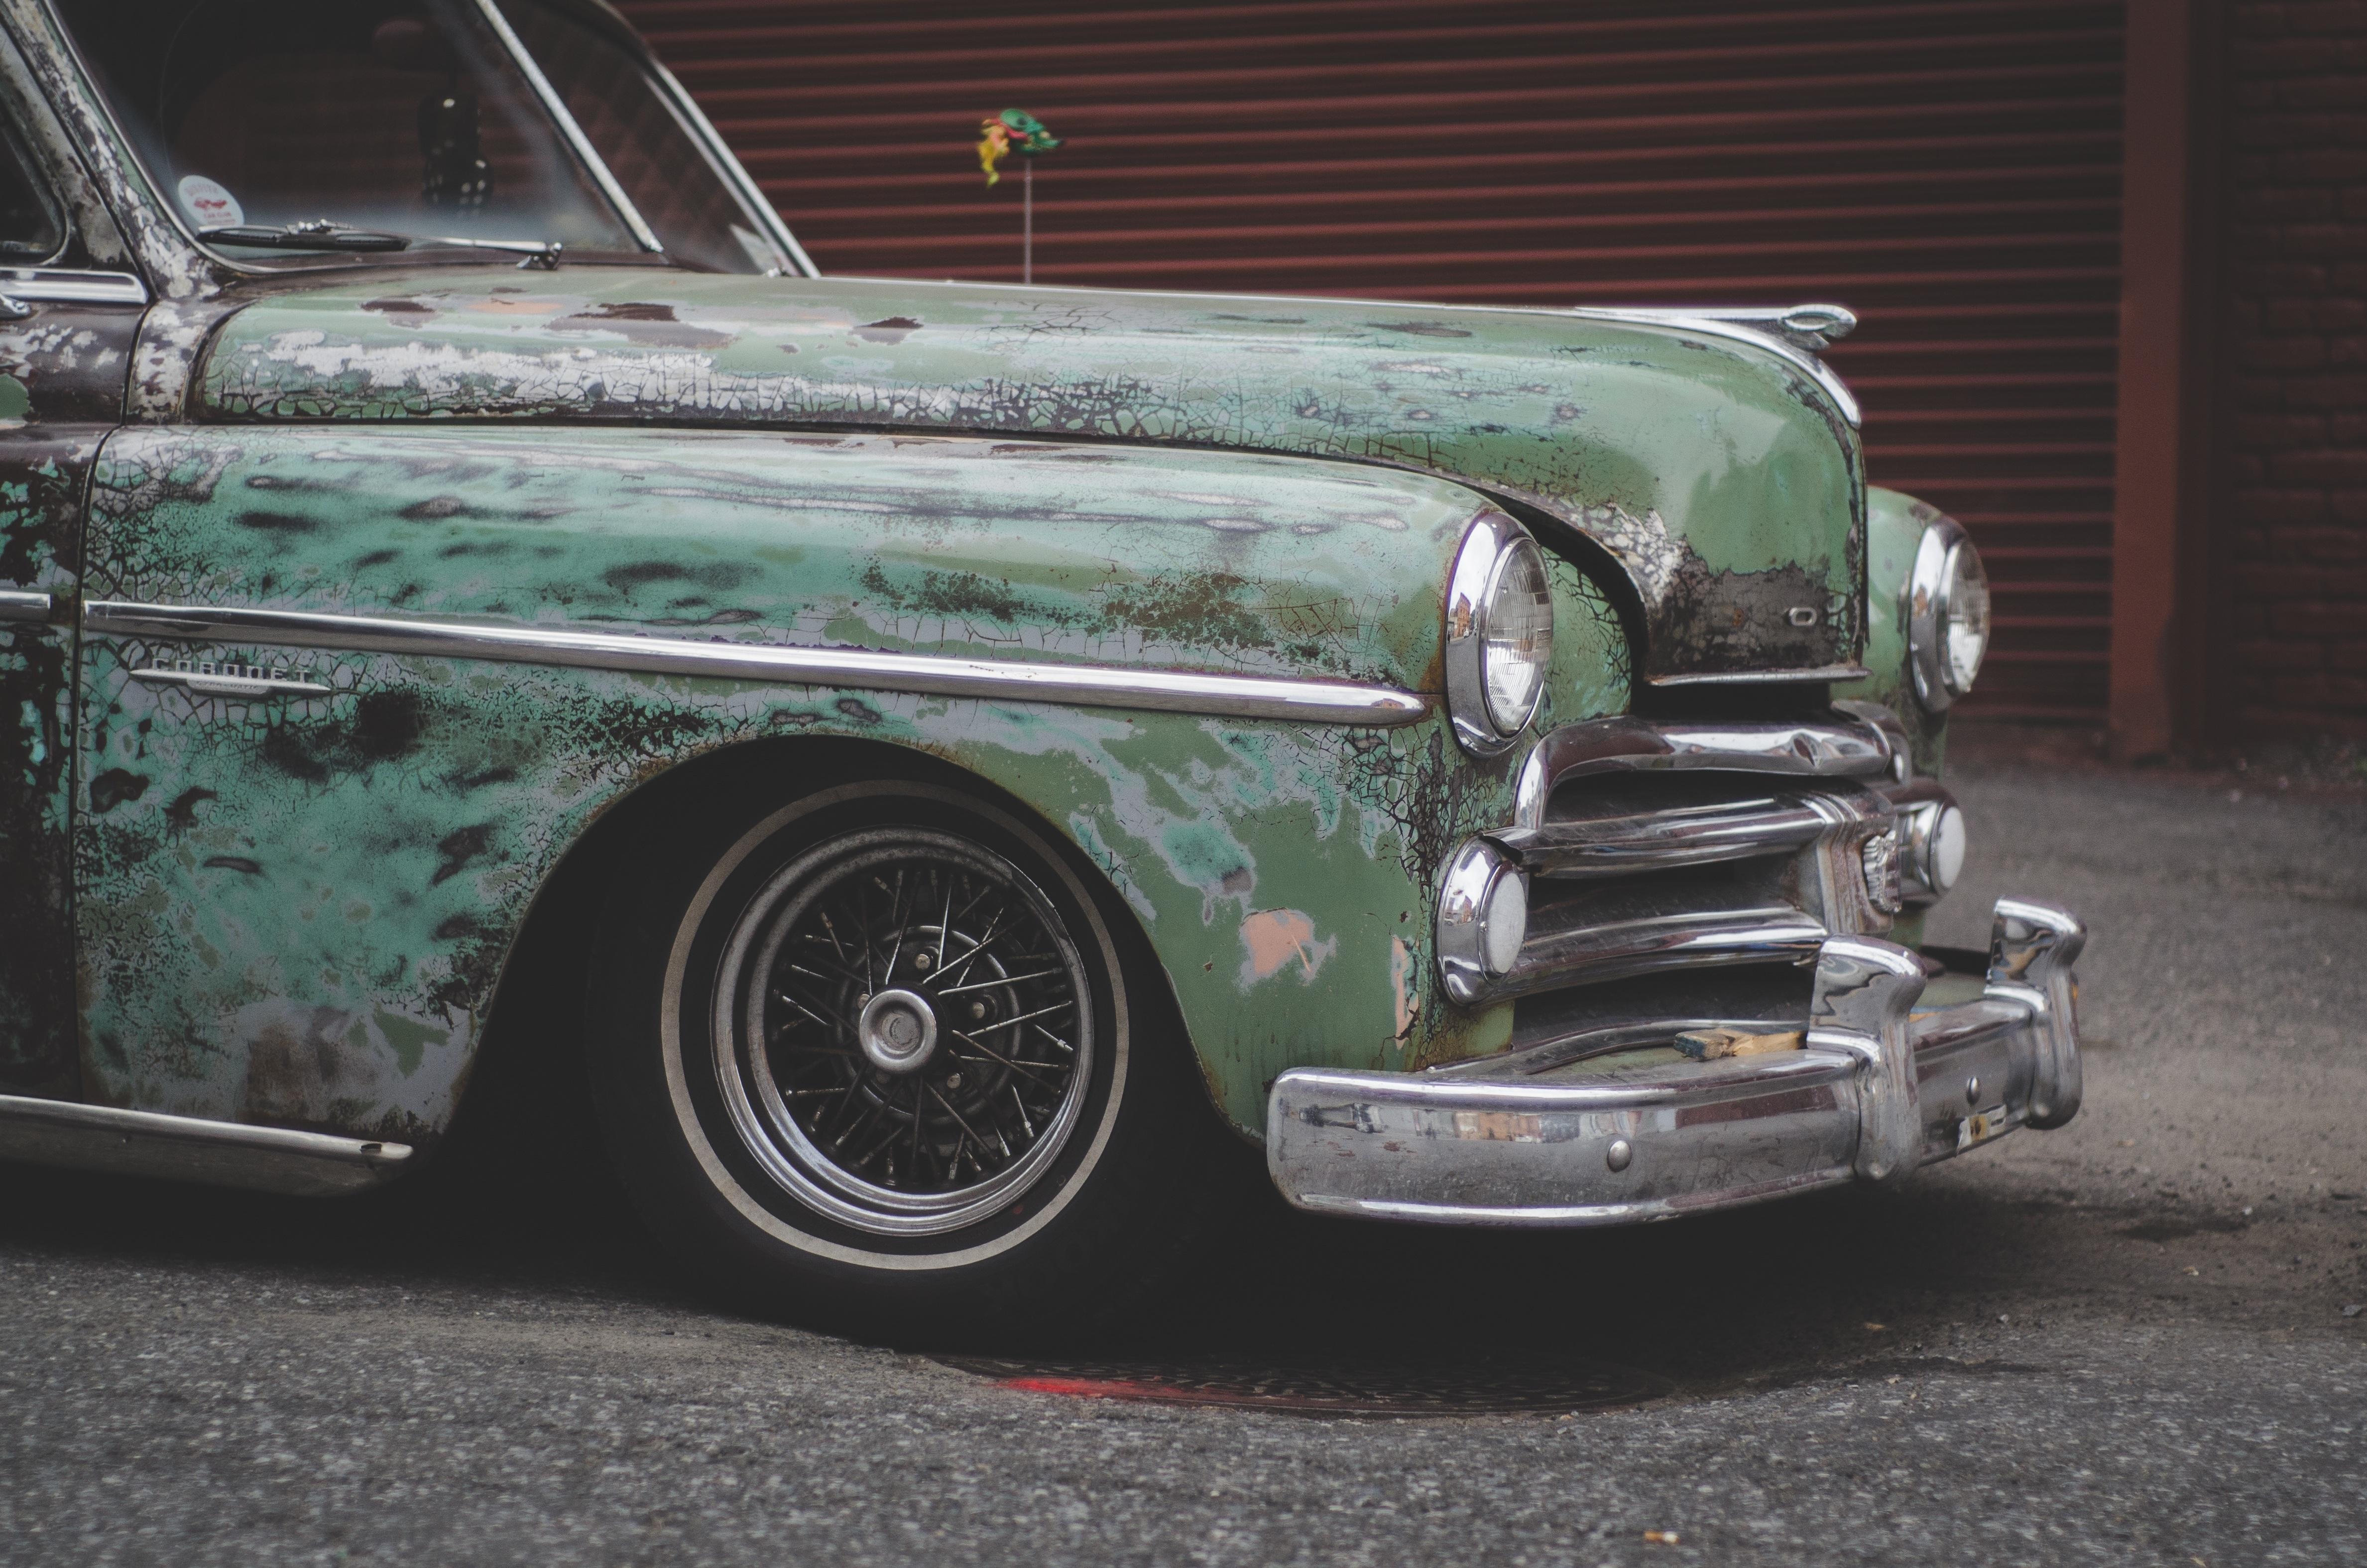 Free Images : retro, old, transportation, nostalgia, dirty, motor ...